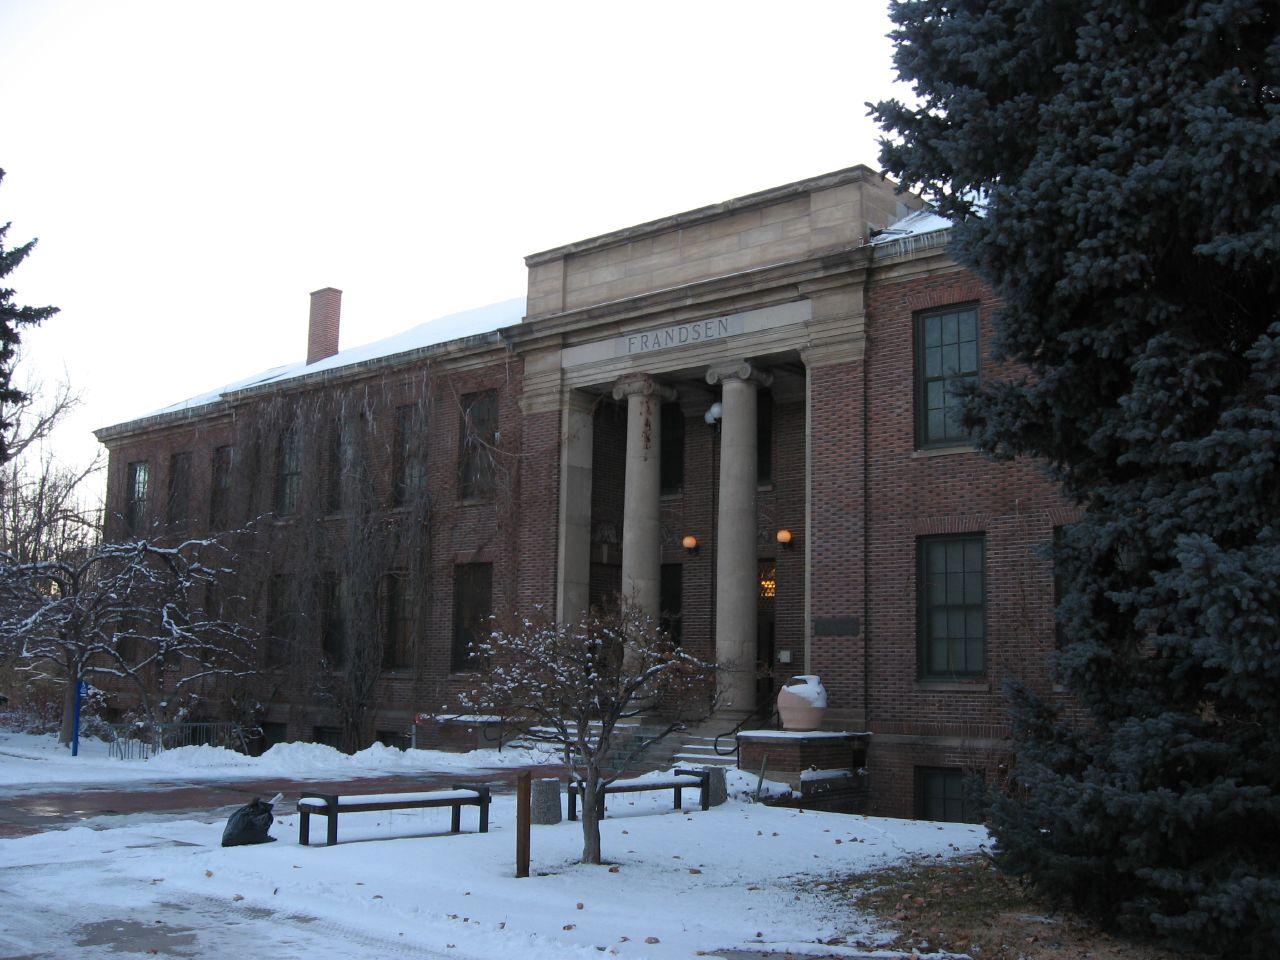 Unr Campus Map Pdf.File Frandsen Humanities Building University Of Nevada Reno